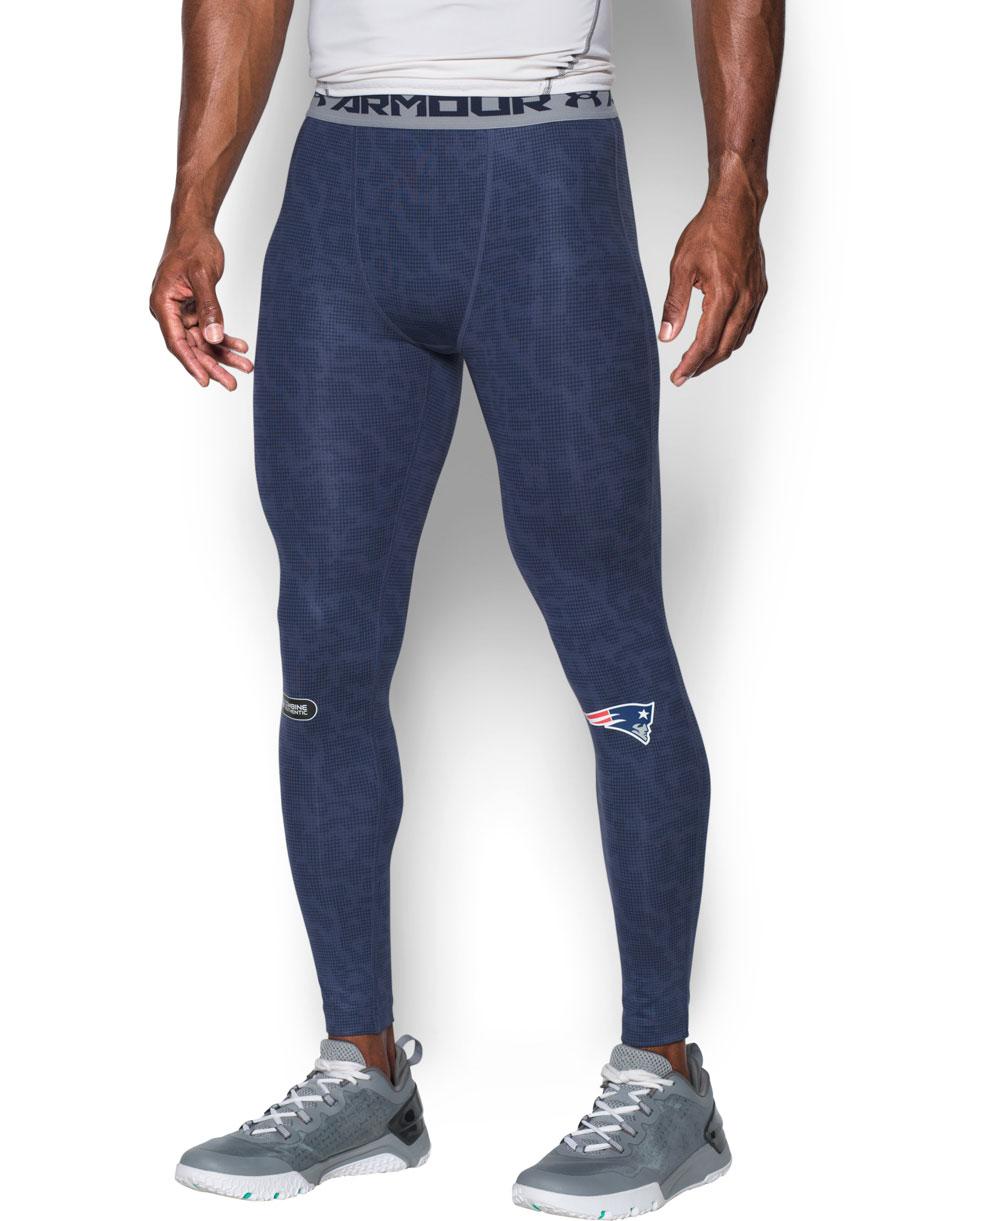 NFL Combine Authentic HeatGear Armour Leggings Uomo New England Patriots